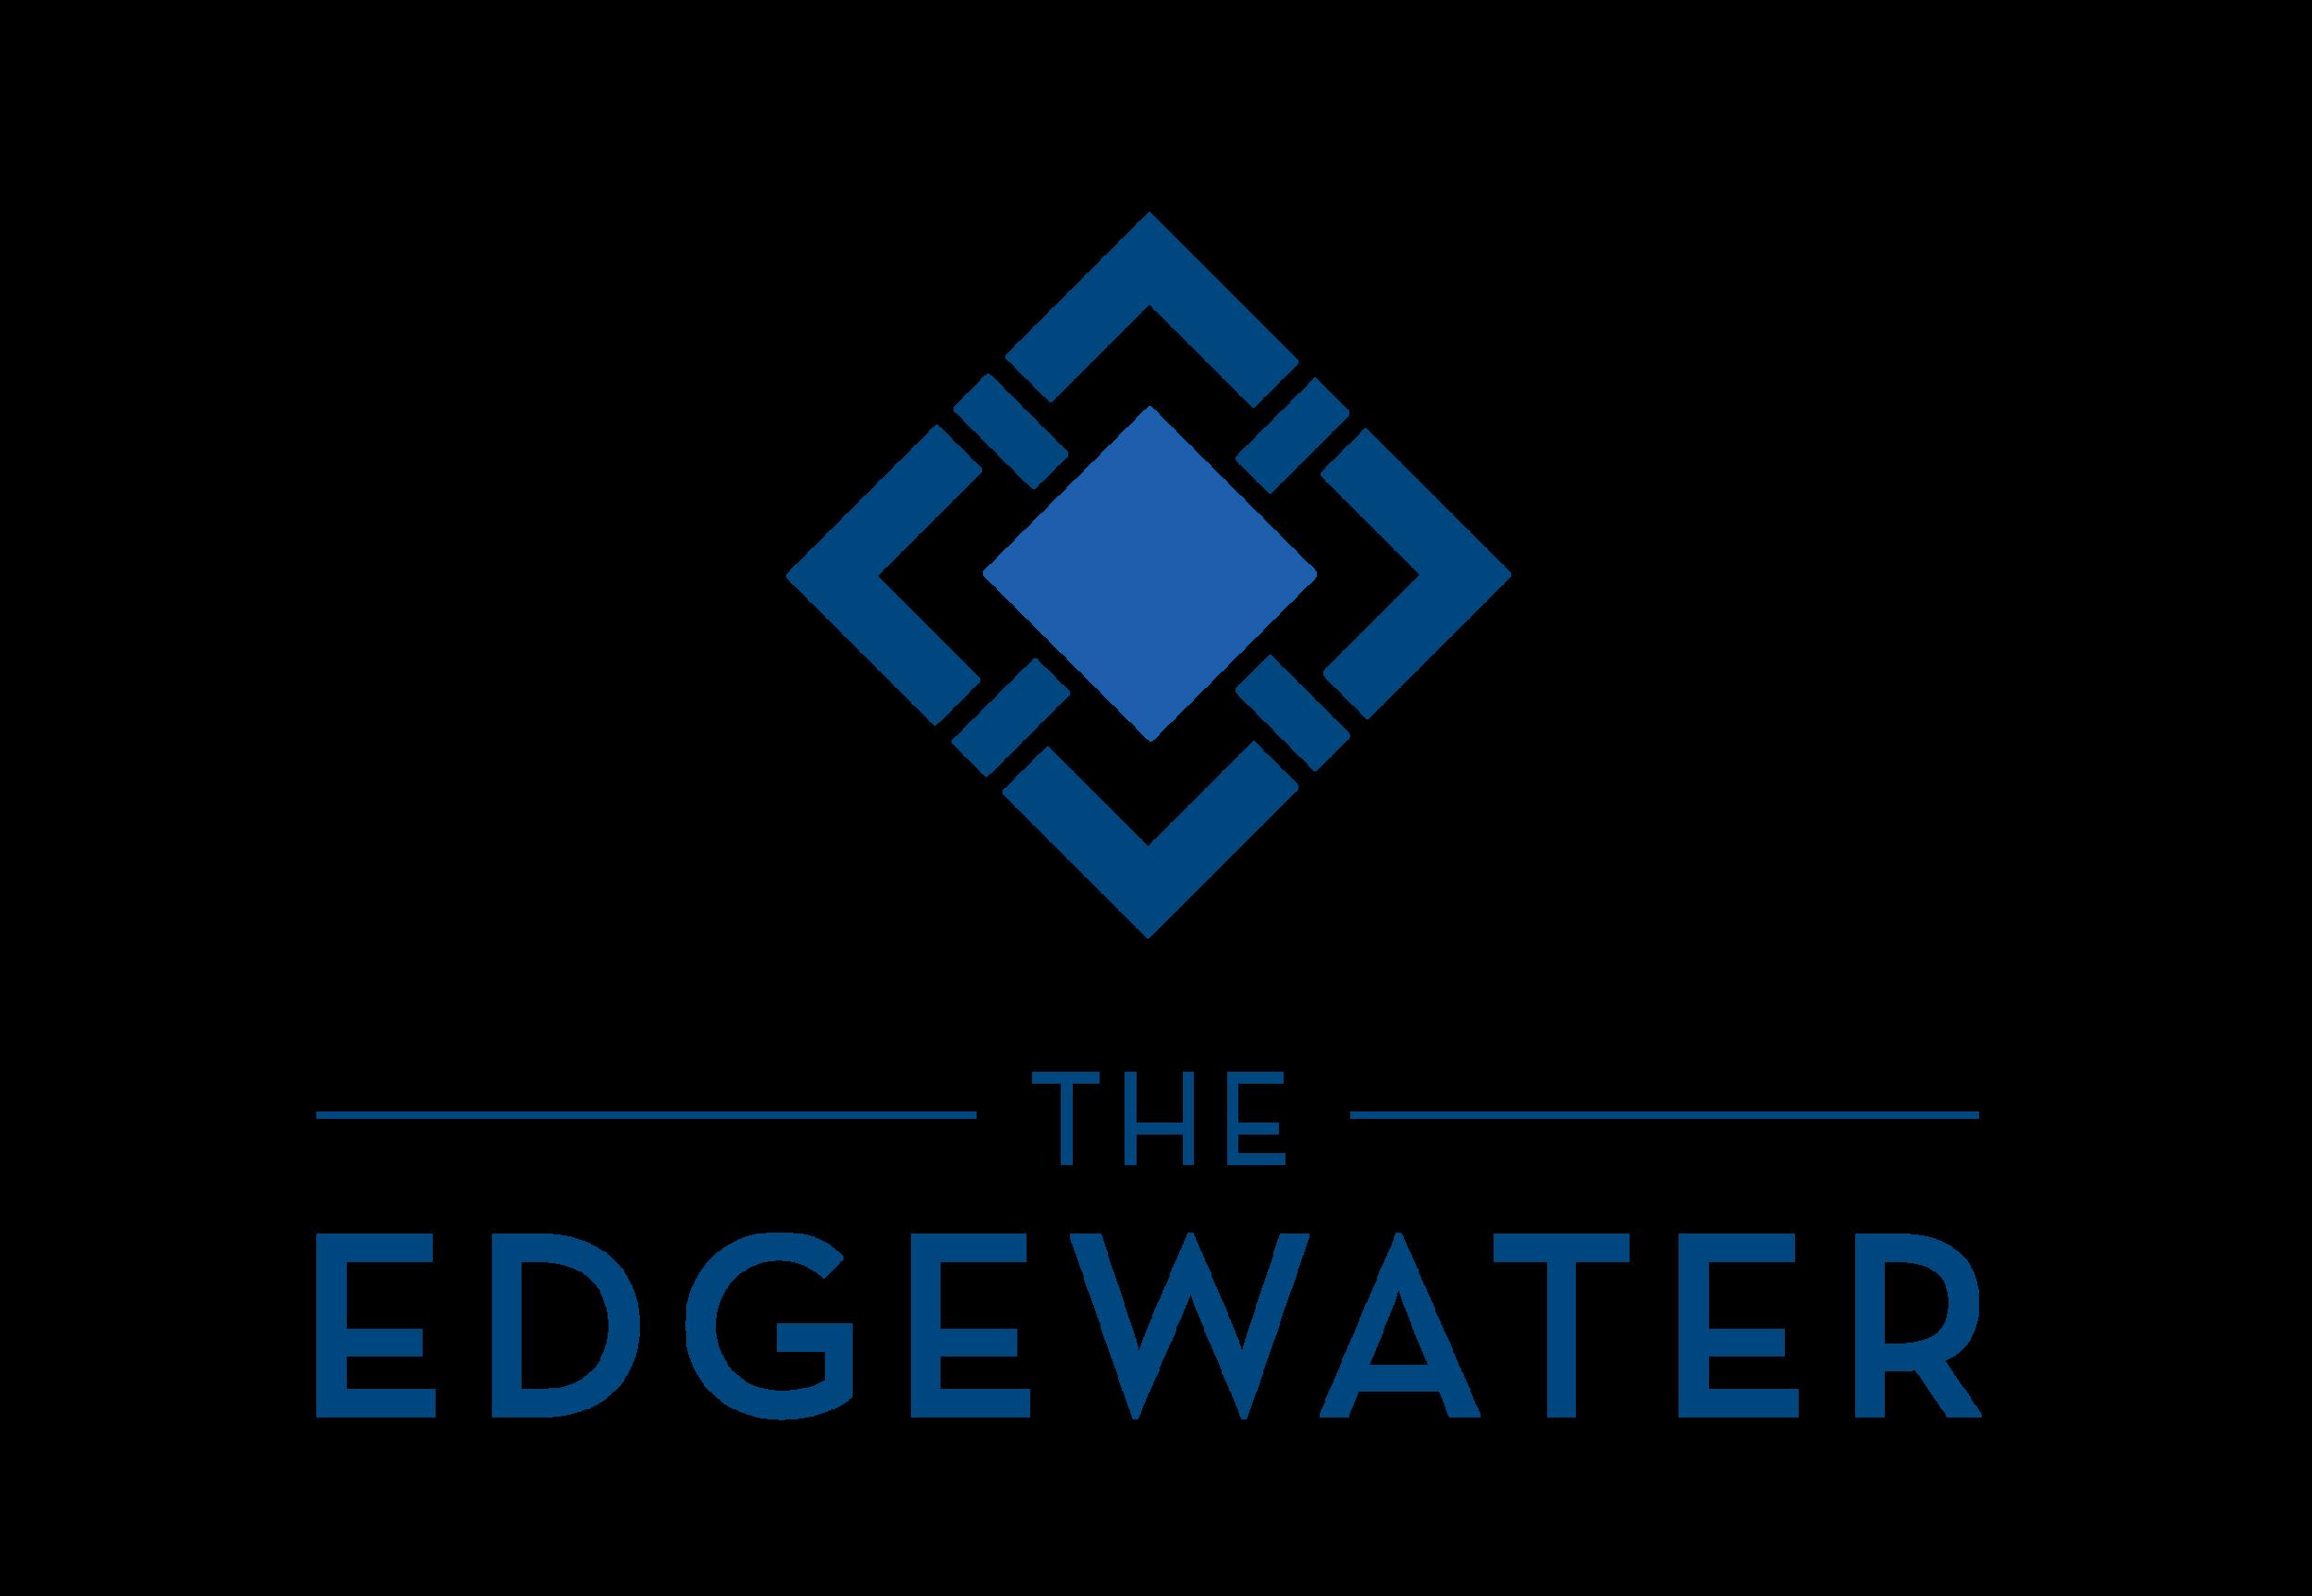 edgewater hotel logo.png